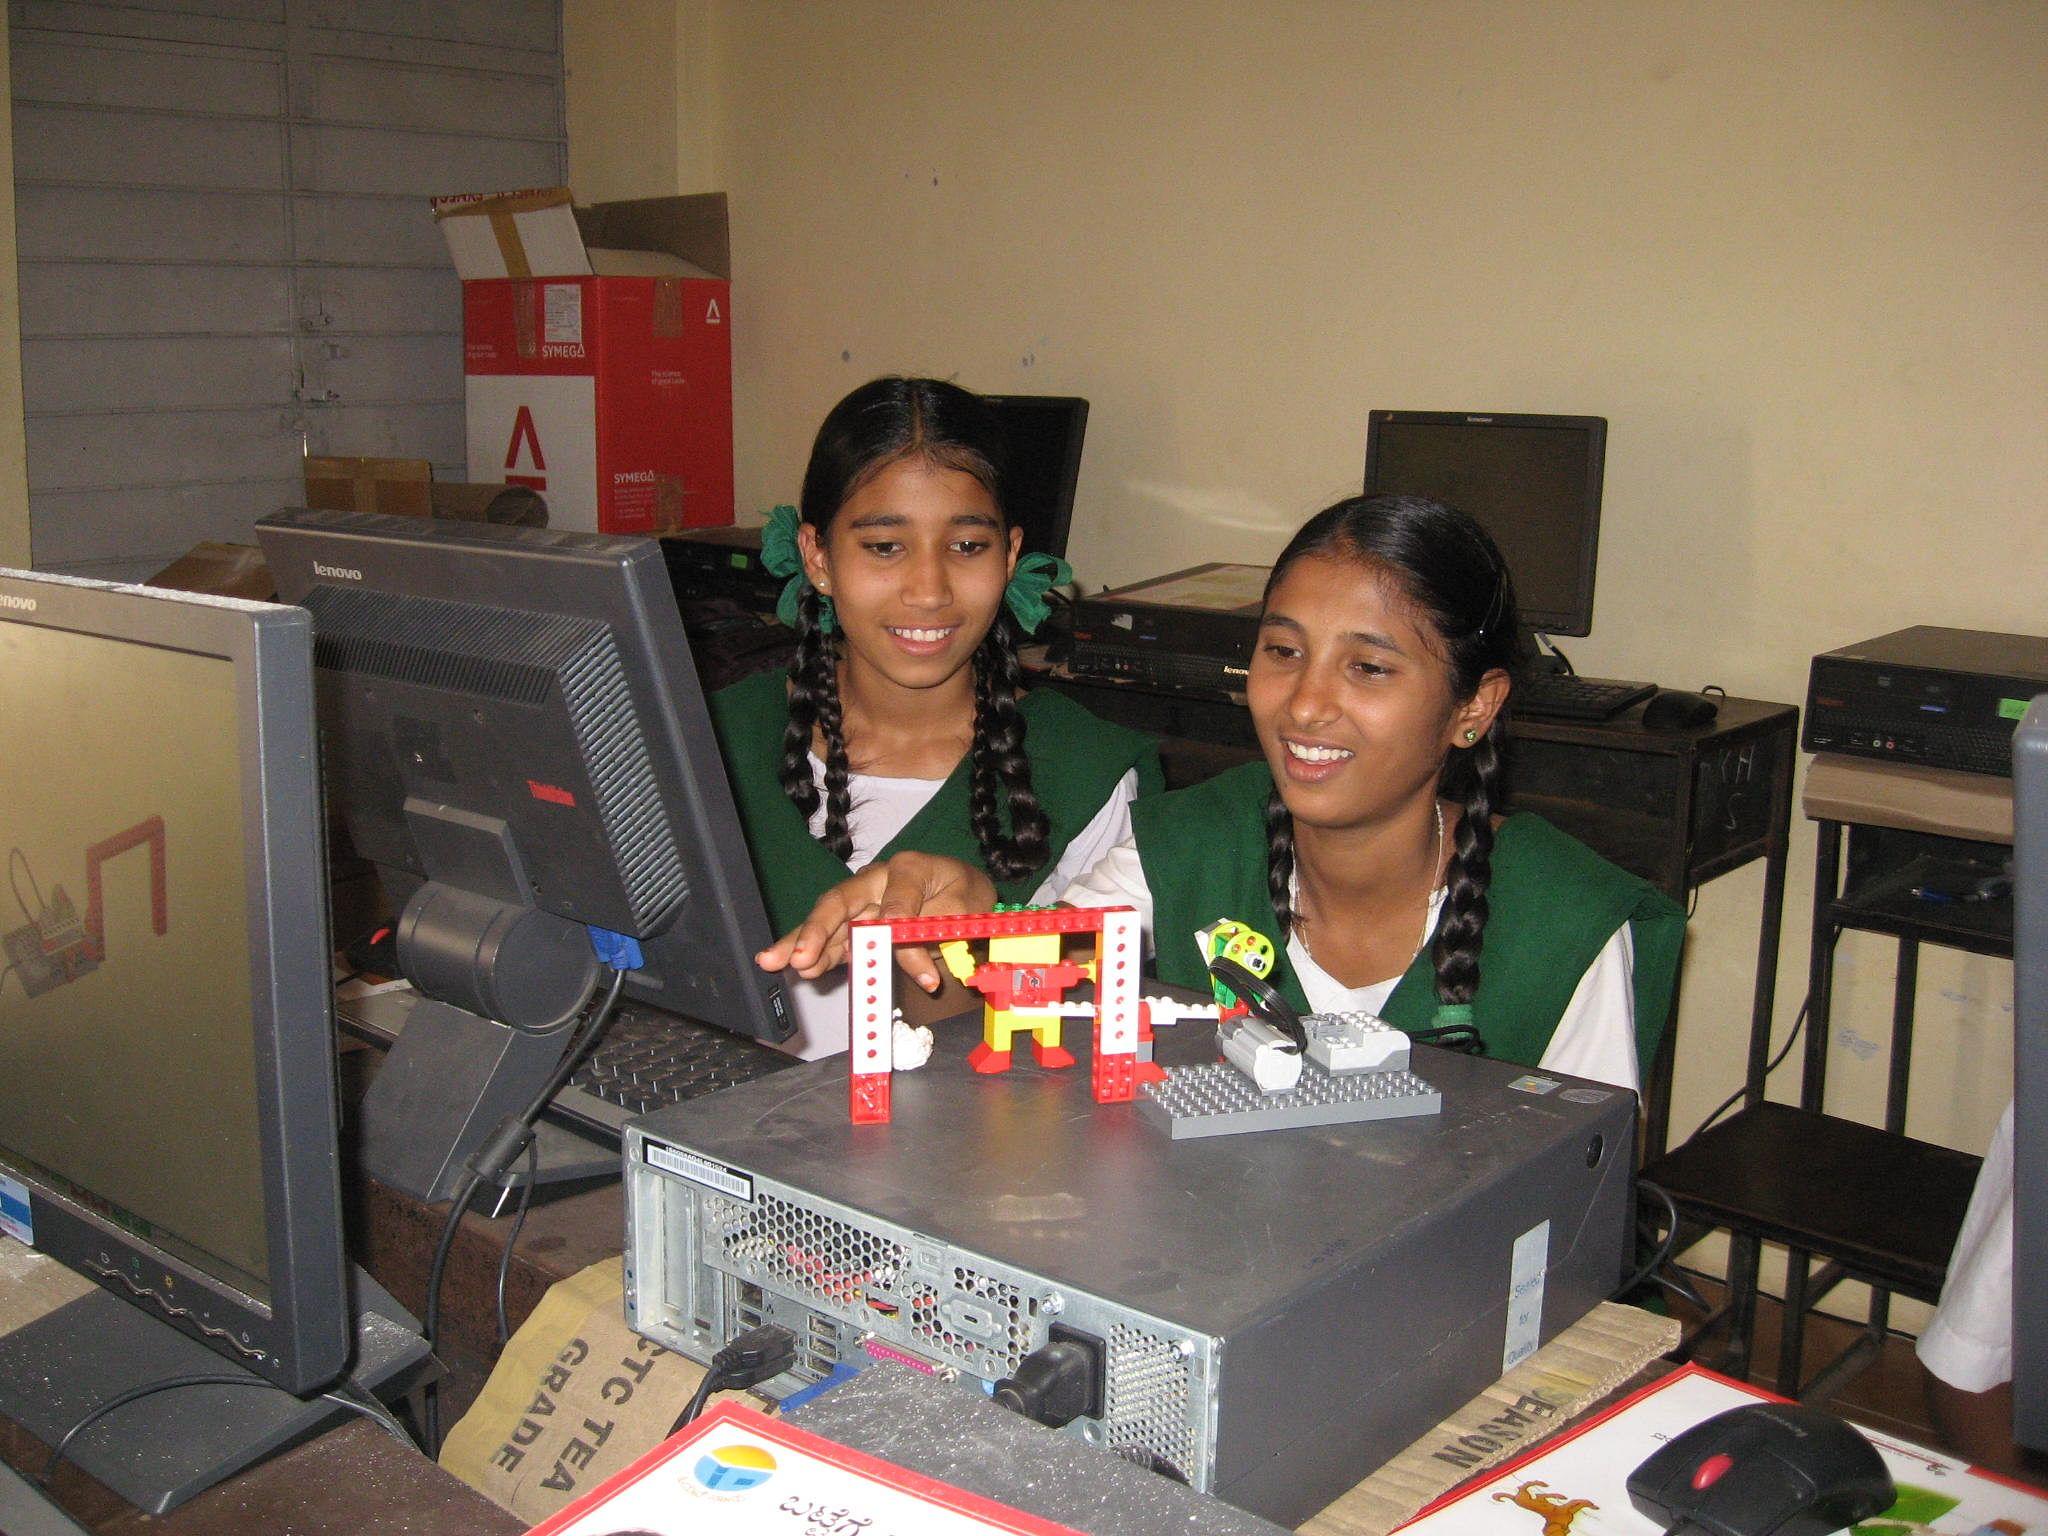 Girls at robotics lab.